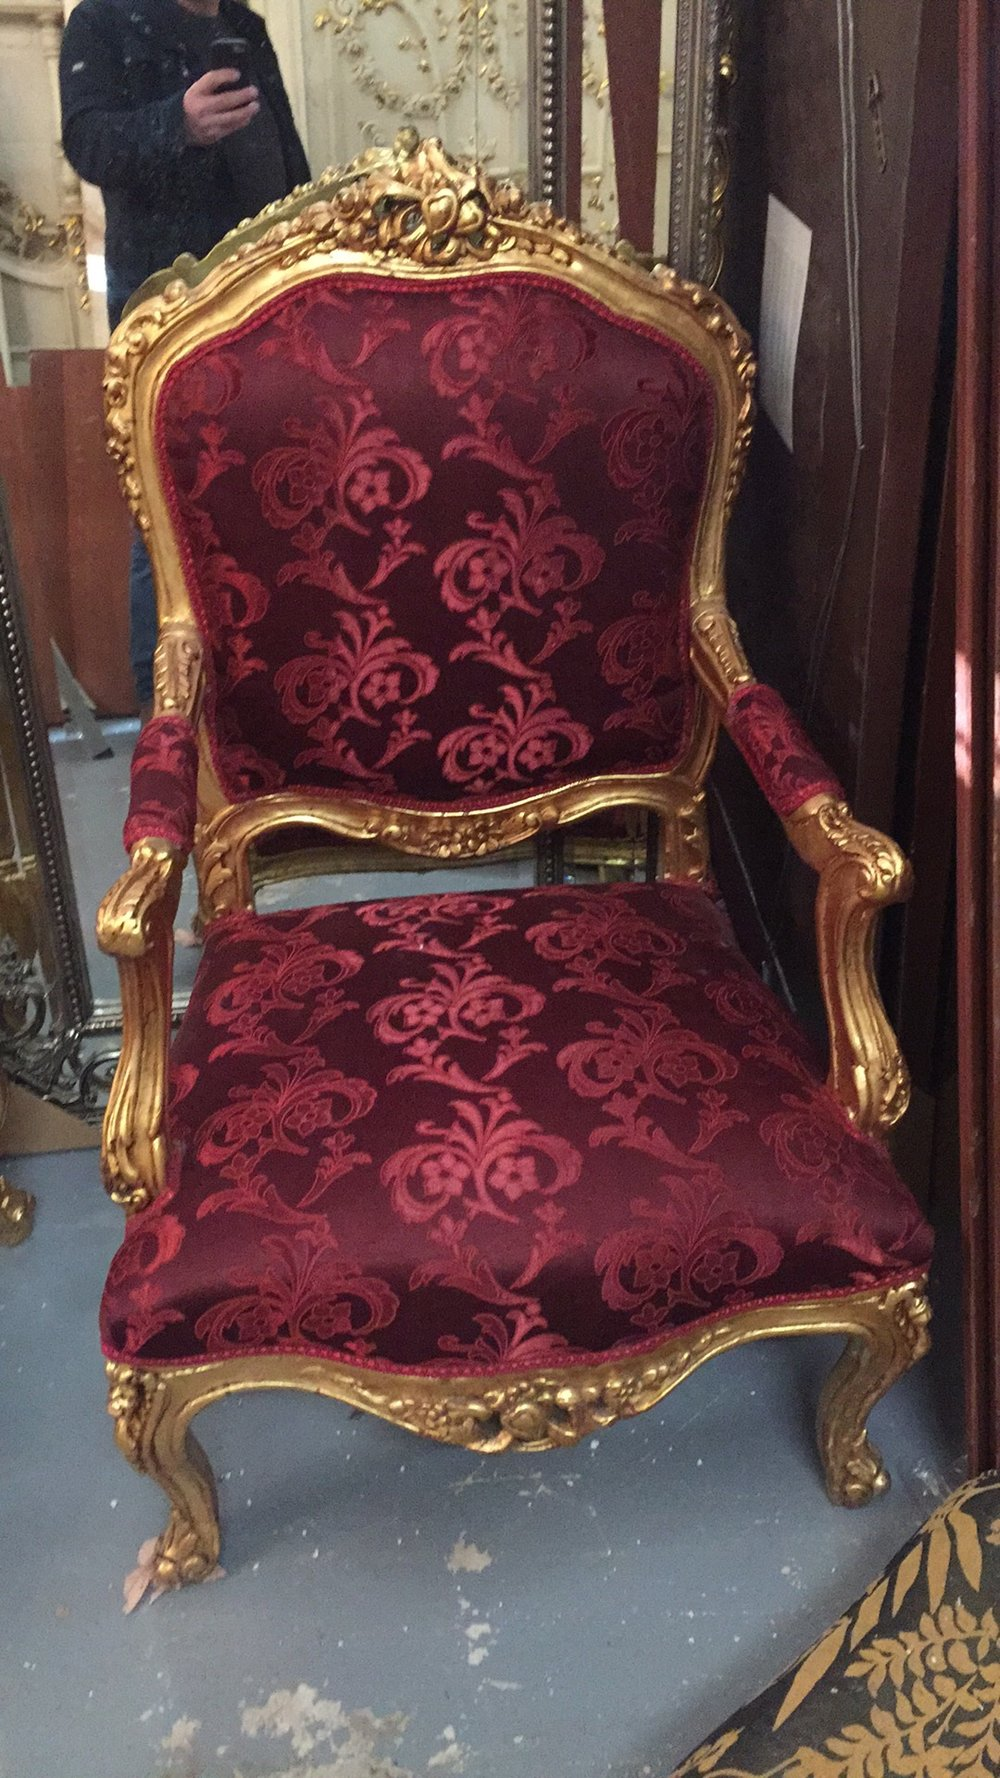 Renaissance Antique Furniture and Lighting Warehouse Dublin Ireland chairs